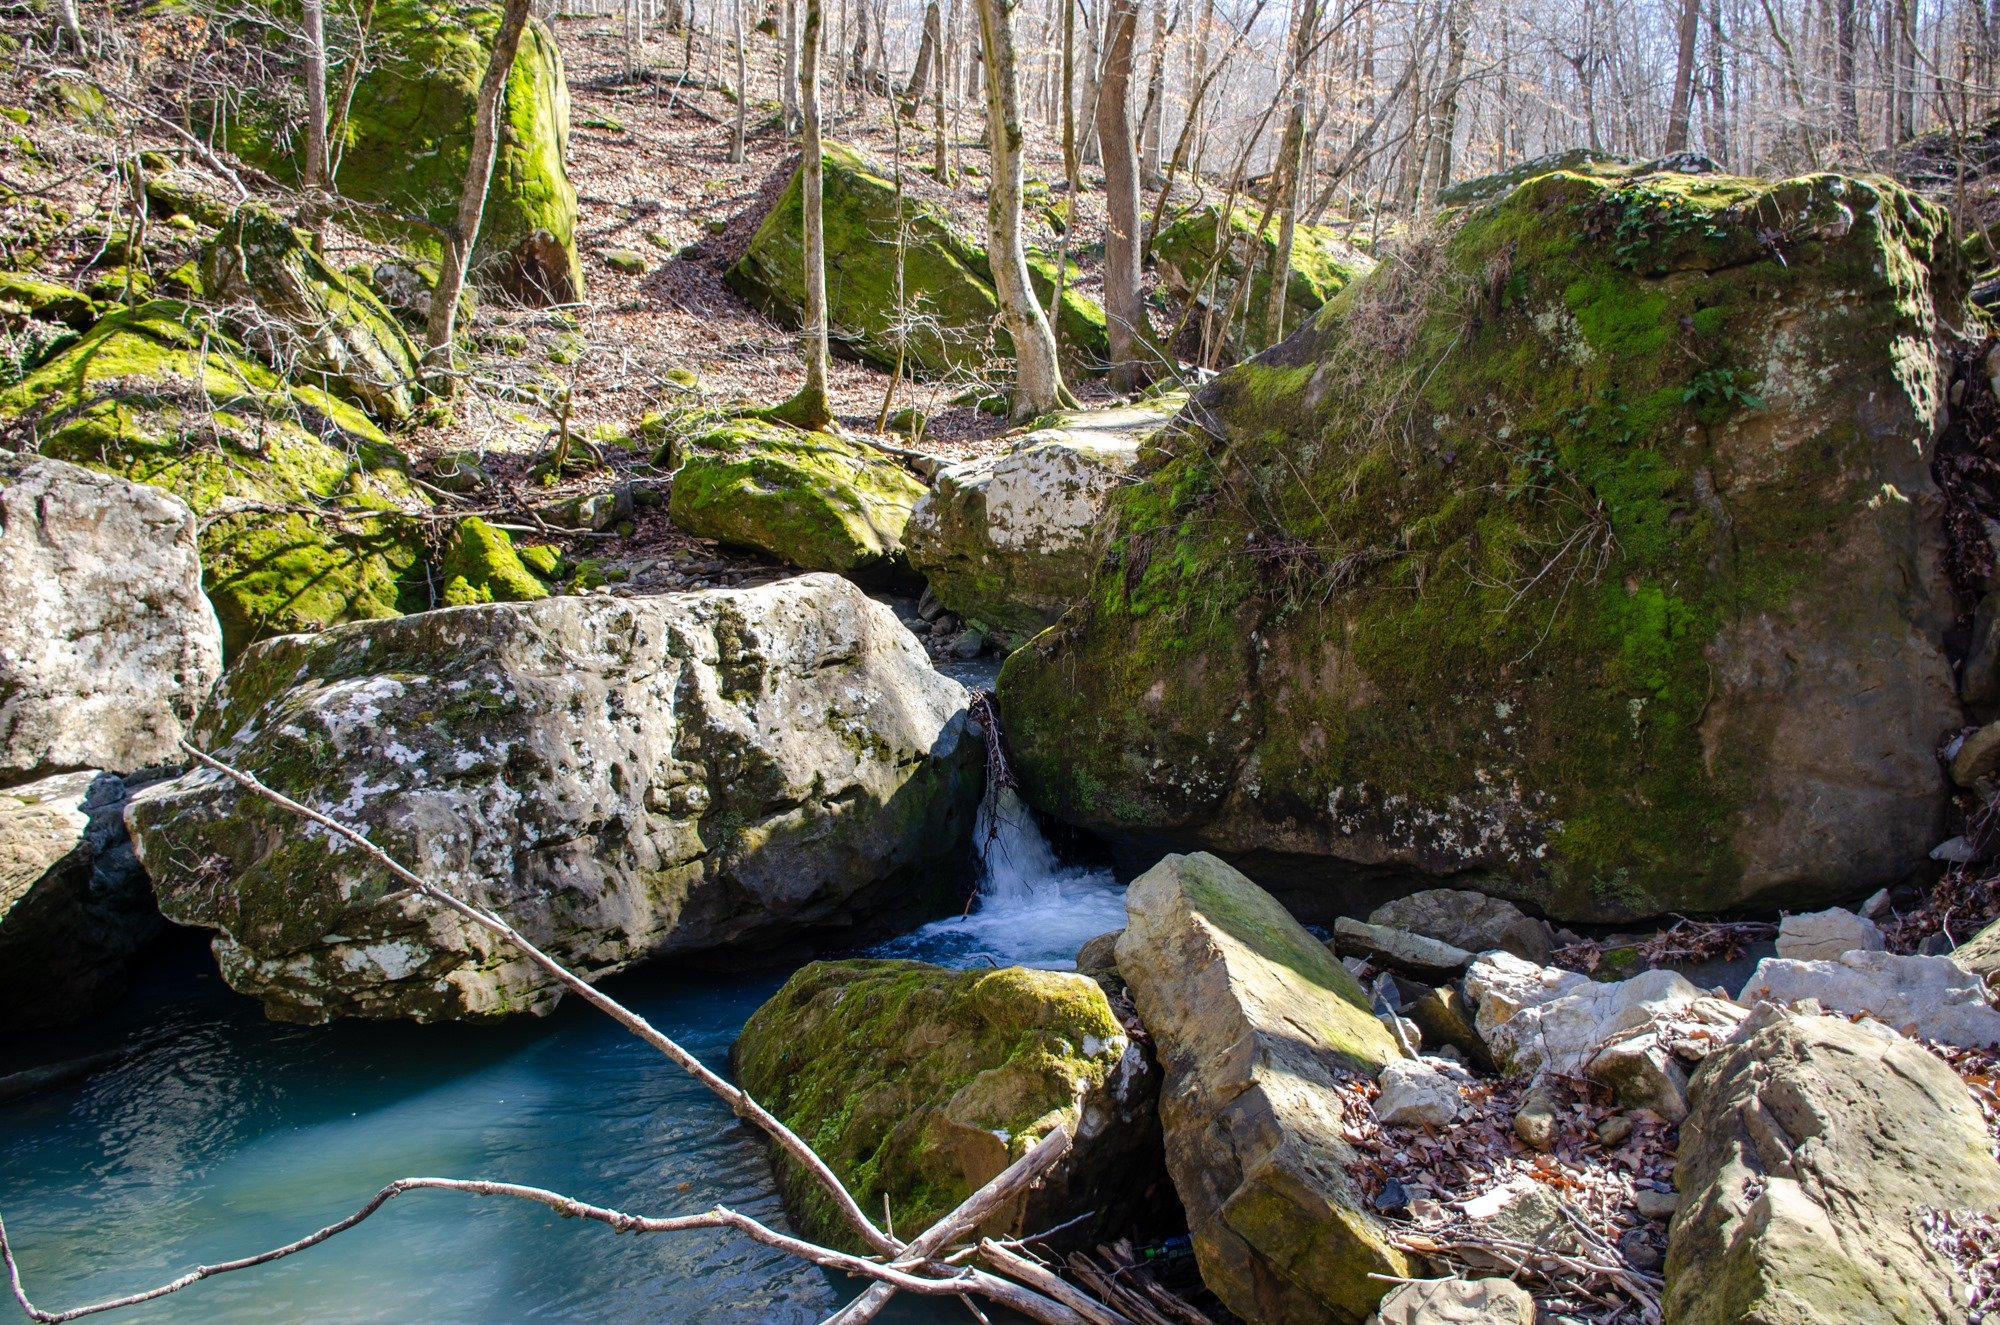 Smith Creek Preserve4